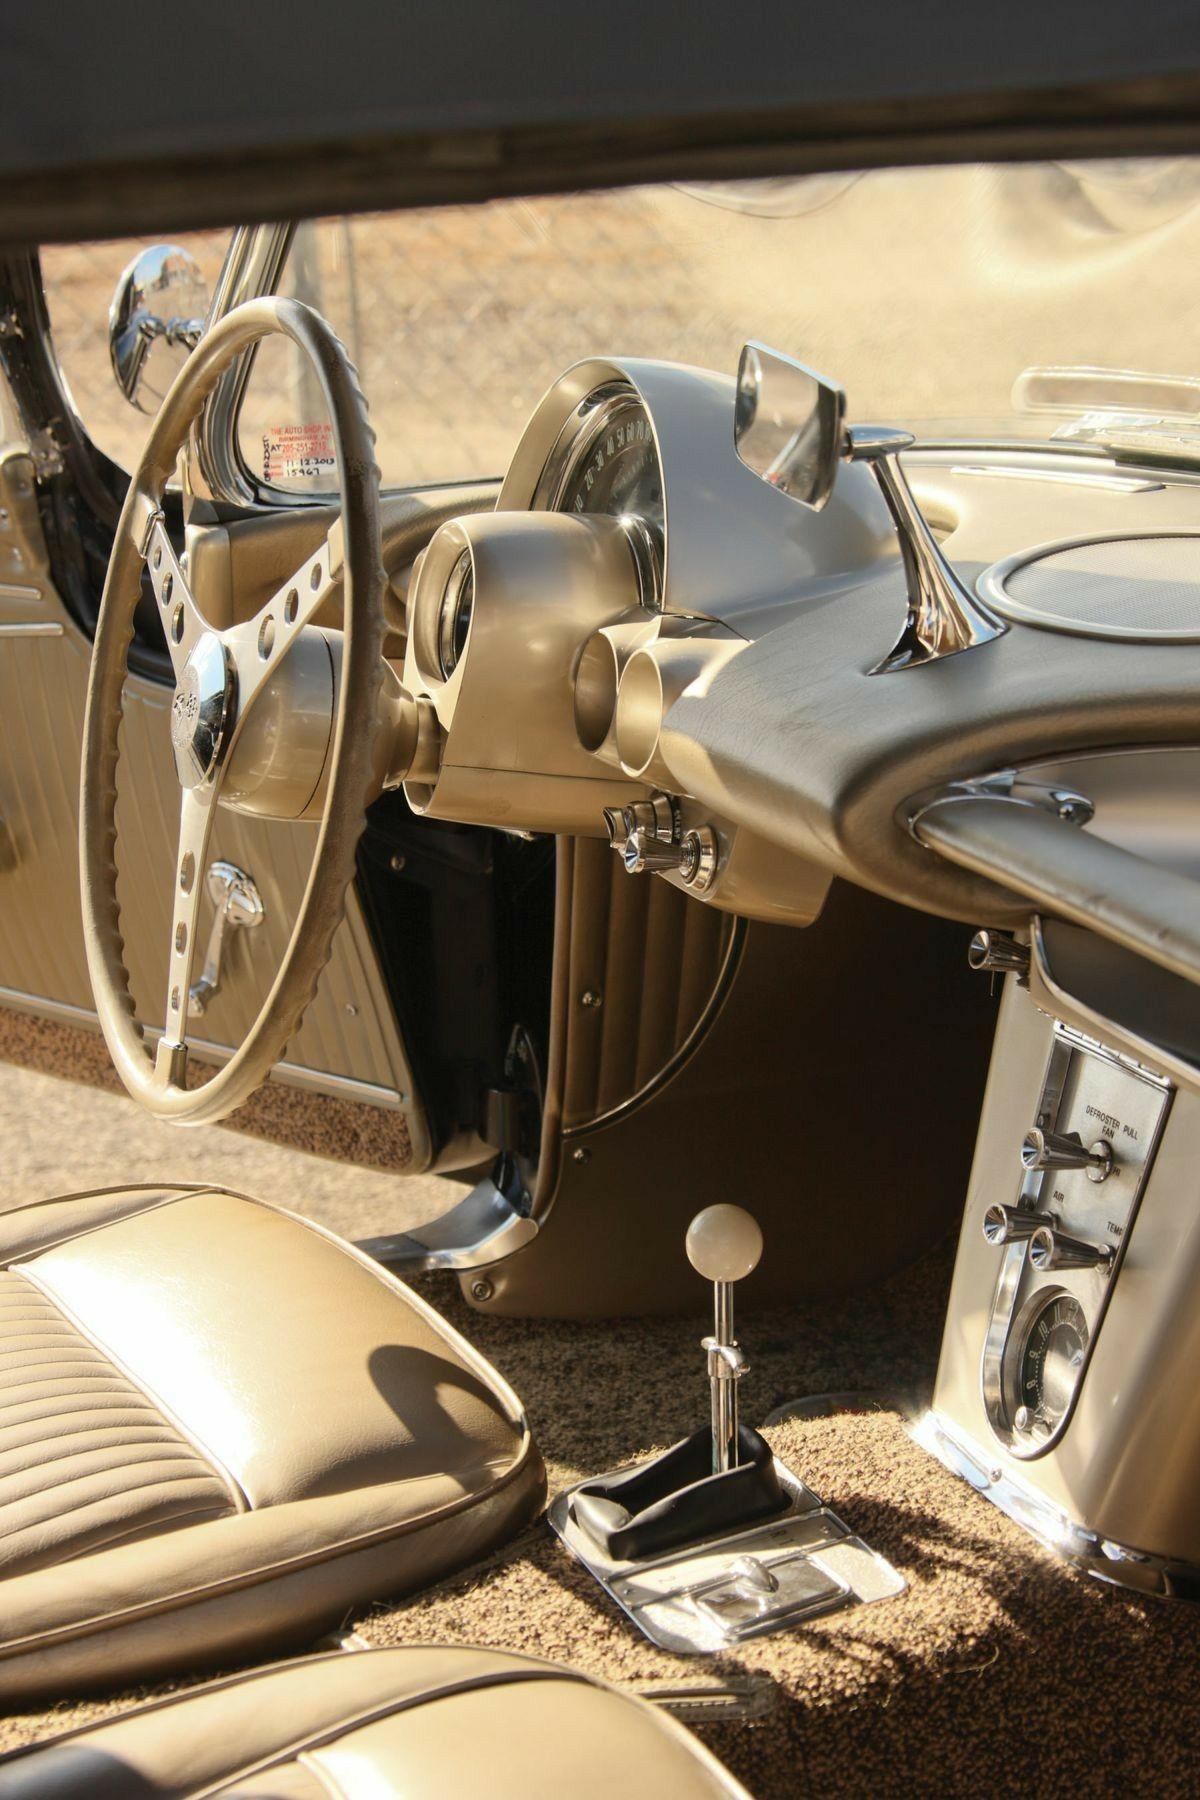 Pin By Cathy Cervone On 240z Interior Ideas Chevrolet Corvette Classic Cars Retro Cars